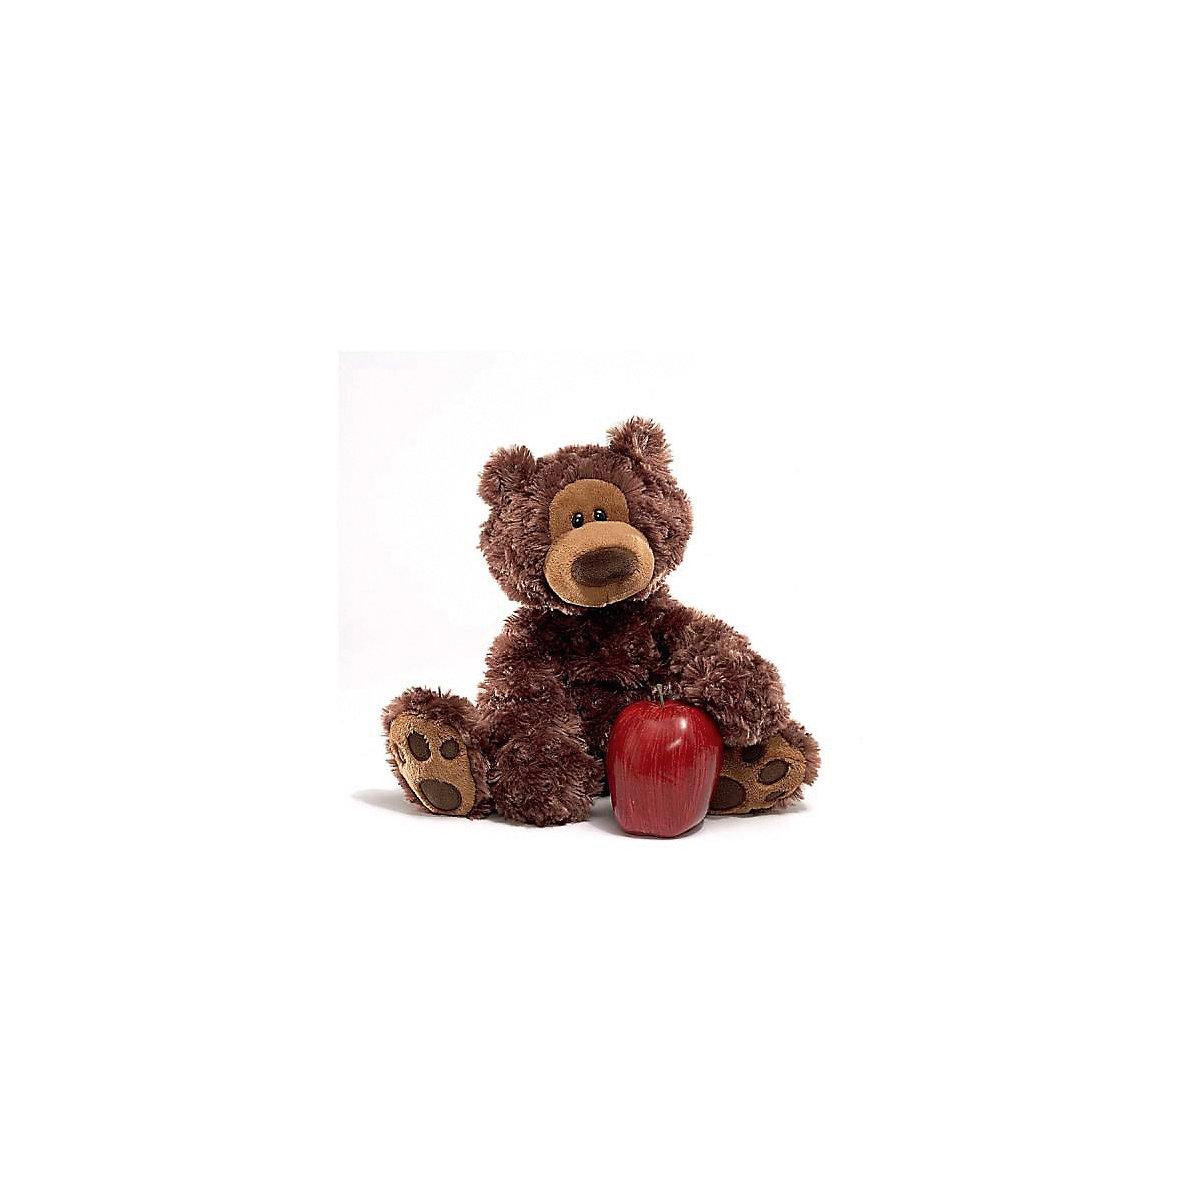 Gund - Philbin Bear Chocolate Small 305 cm Spin Master RX4Zf